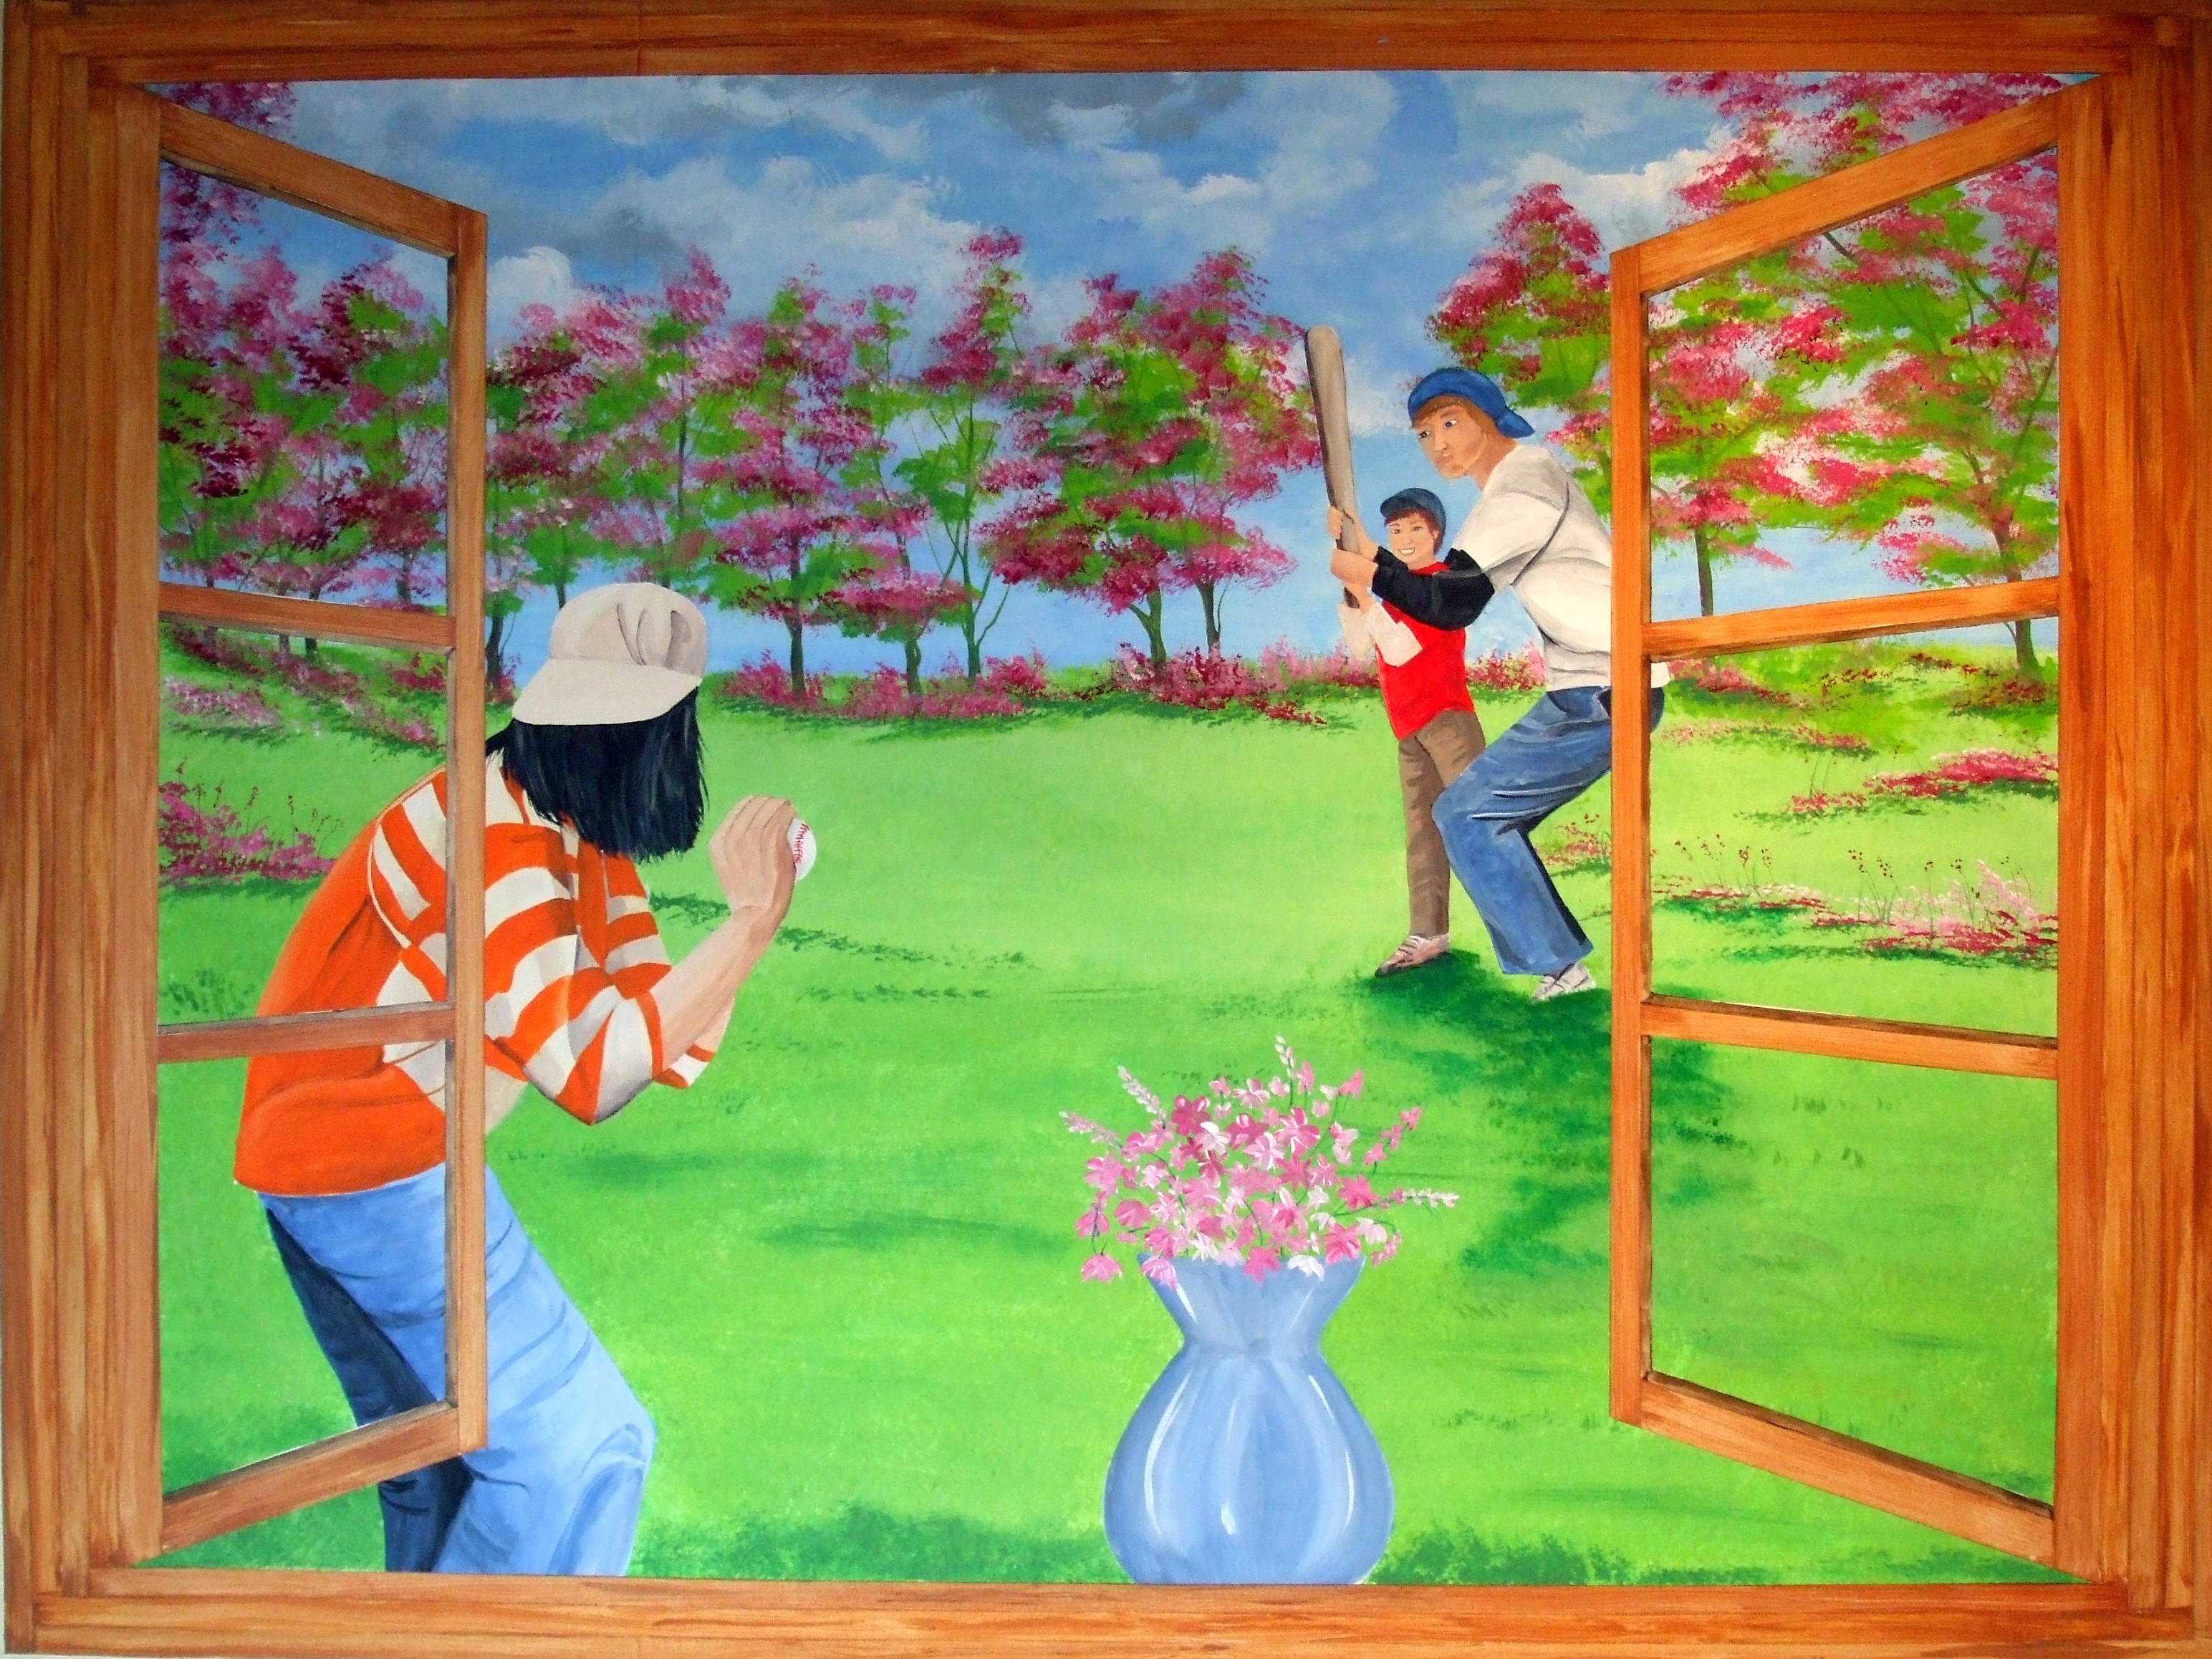 play ball mural